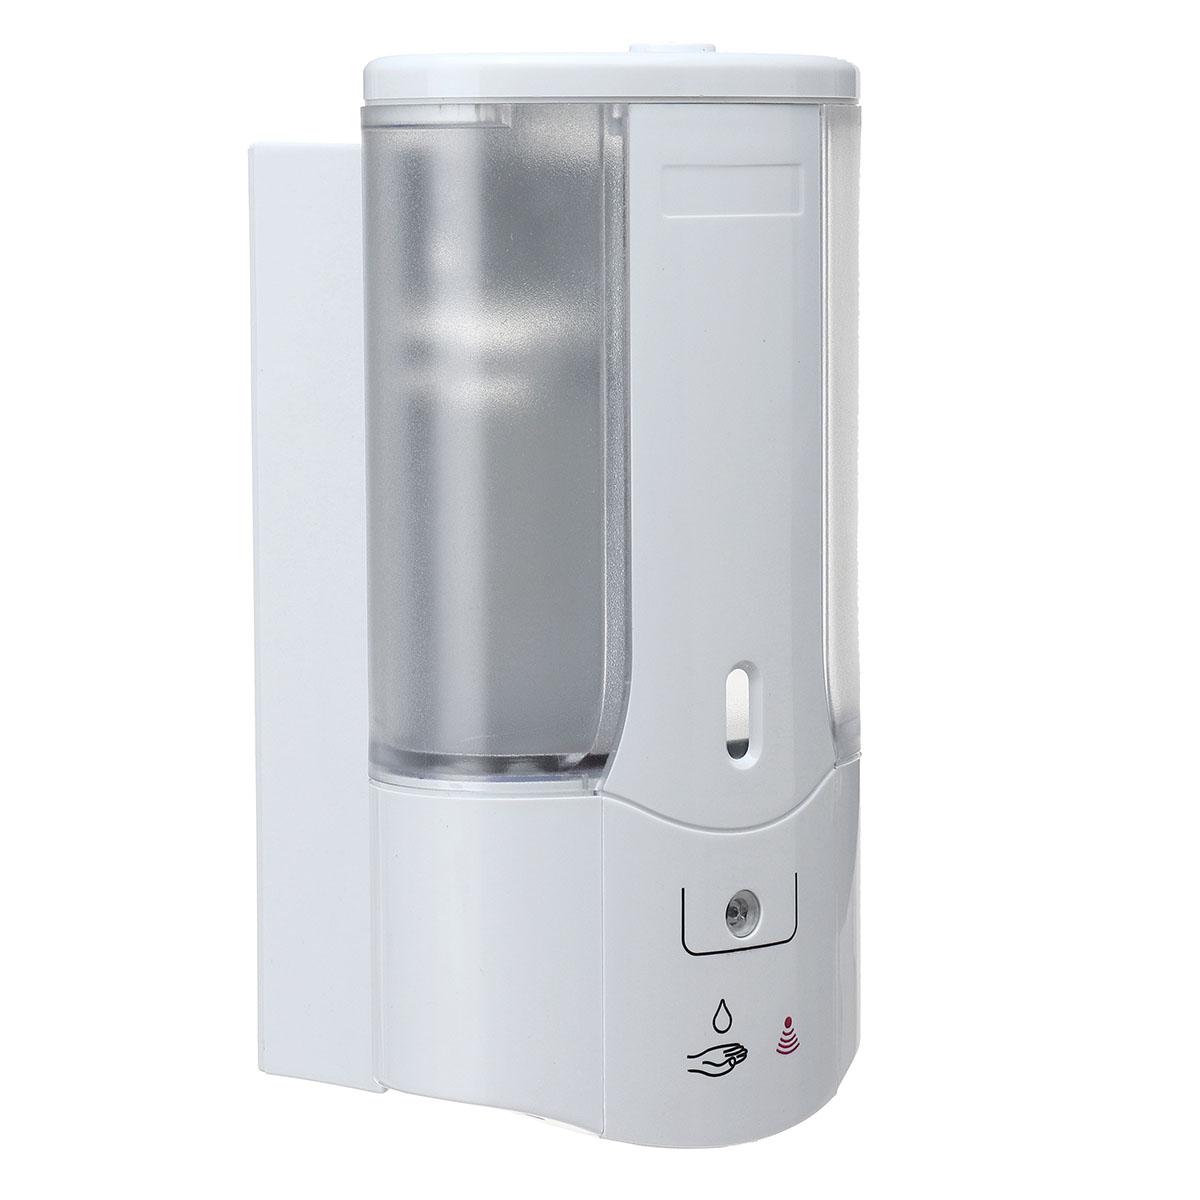 500mL Automatic Sensor Hand-Free Soap Dispenser Shampoo Bathroom Wall Mounted